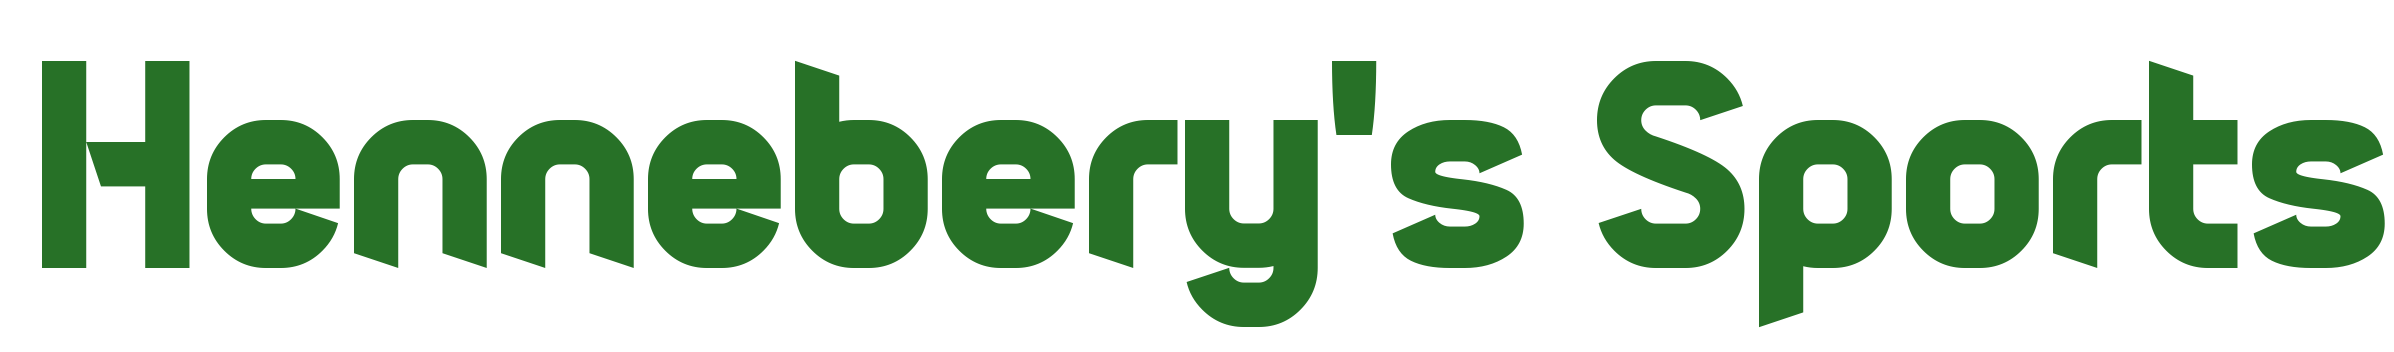 Hennebery Sports